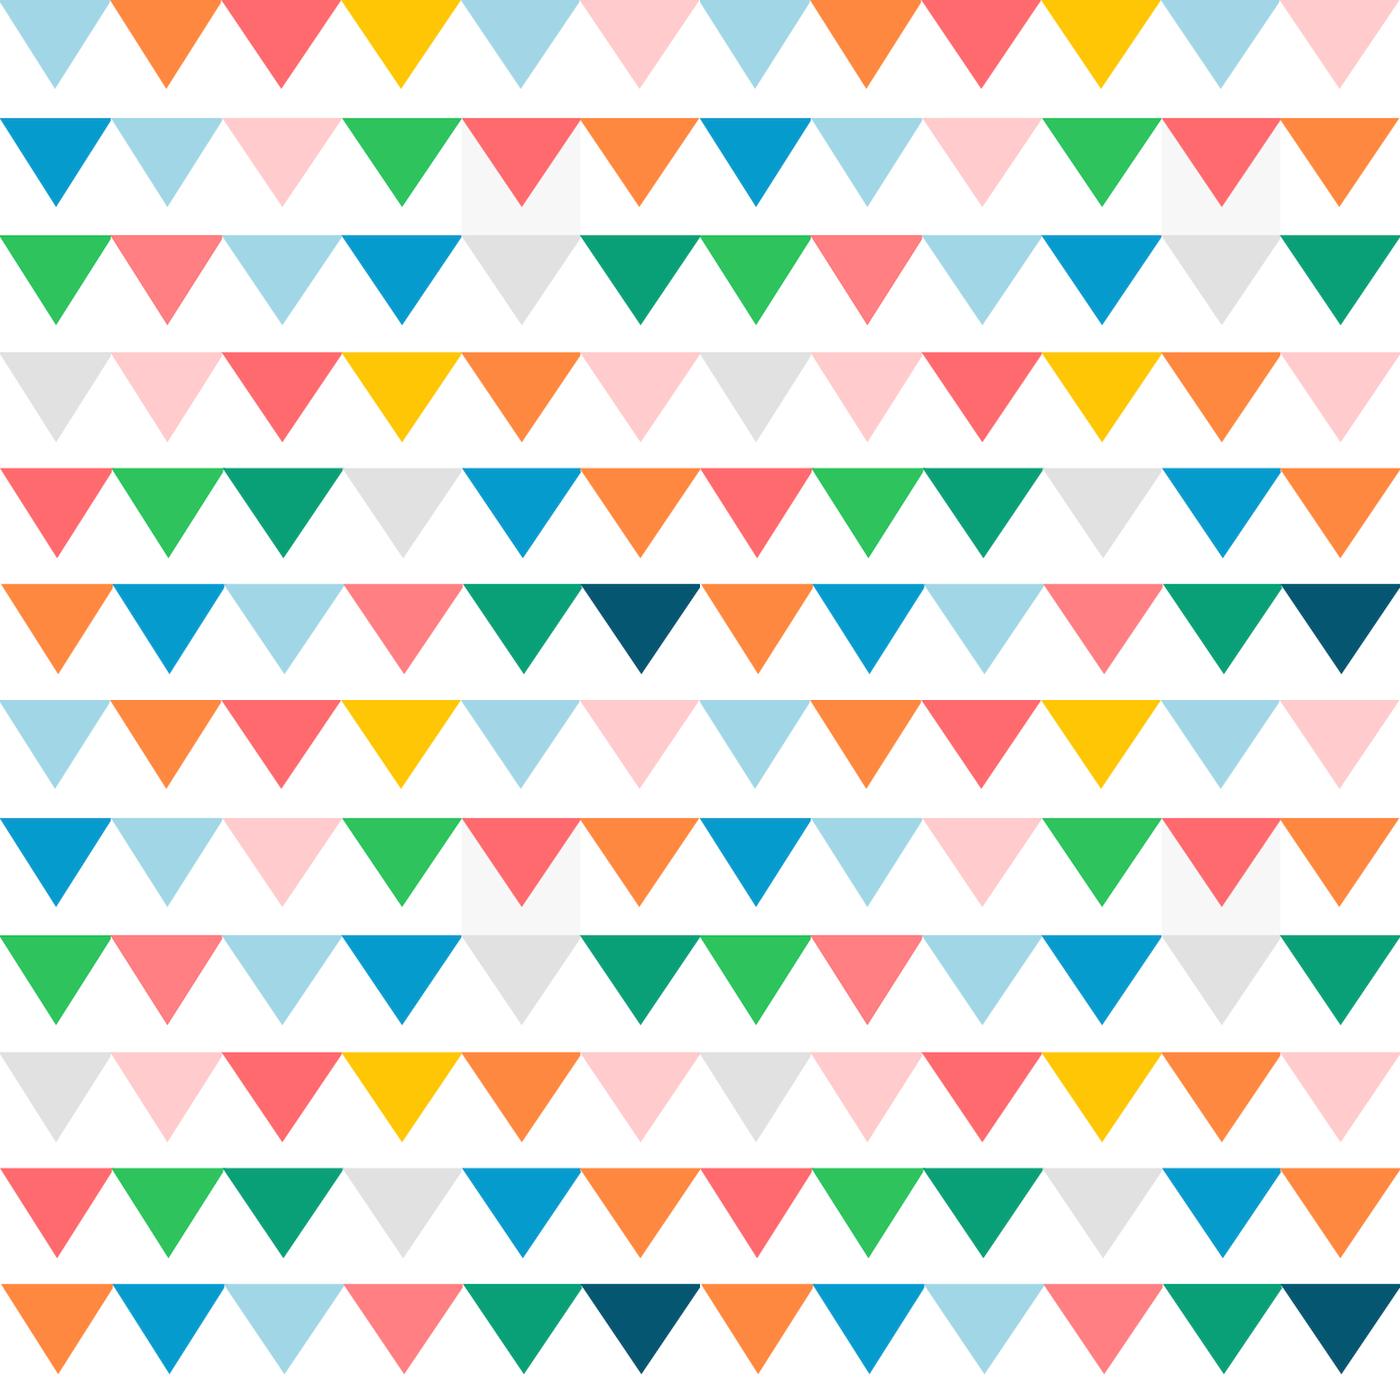 Free Colorful Scrapbooking Paper – Joyful Gift Wrapping Paper - Free Printable Wrapping Paper Patterns